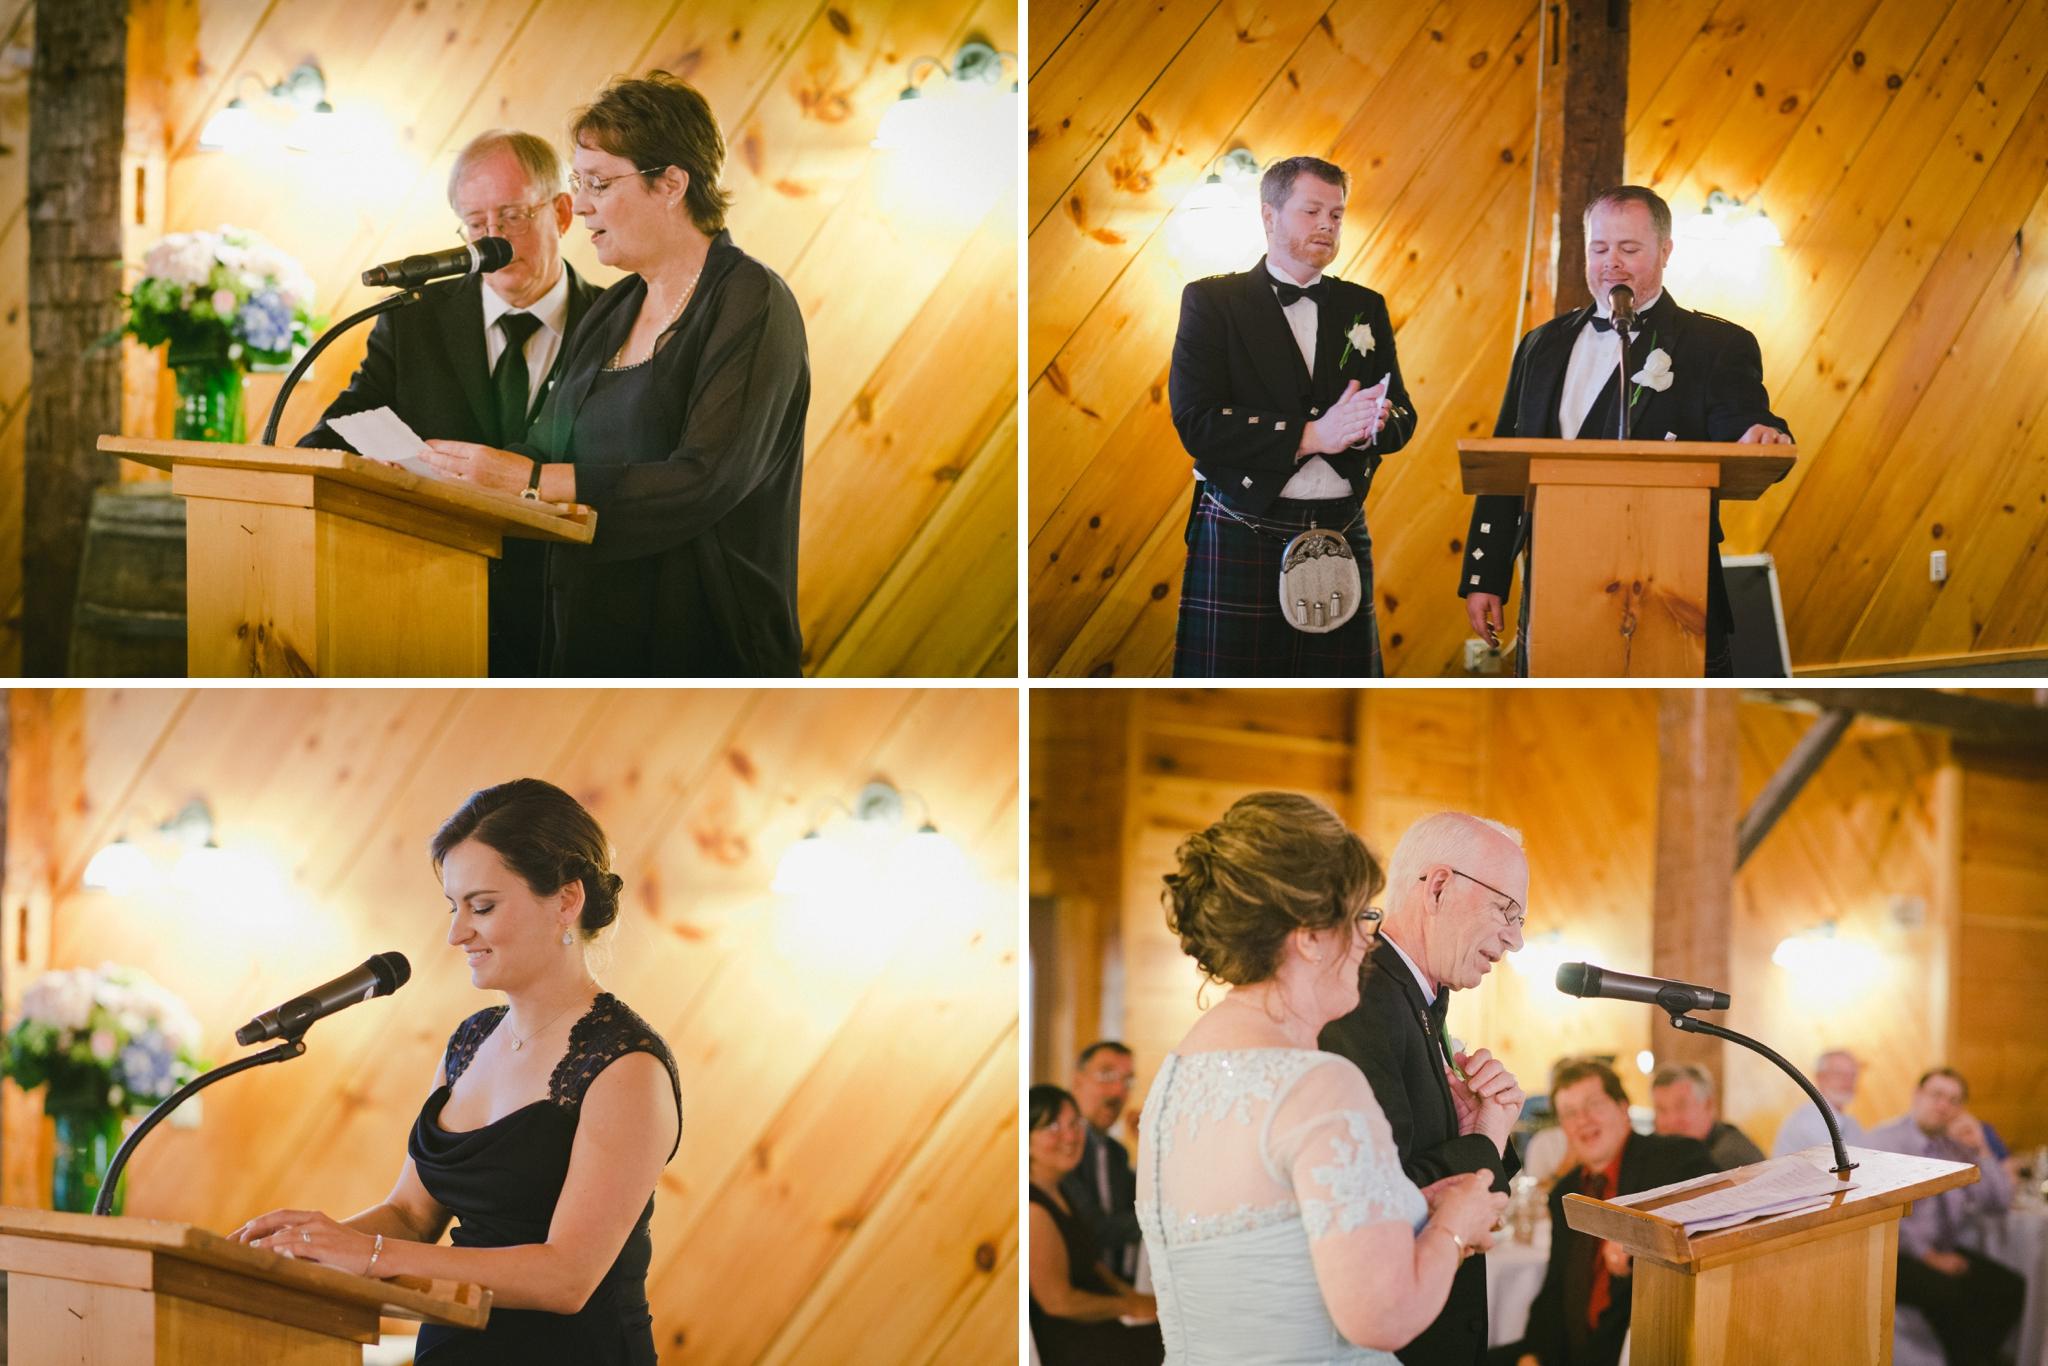 43-wedding-toasts-and-speeches-dinner-hernder.jpg